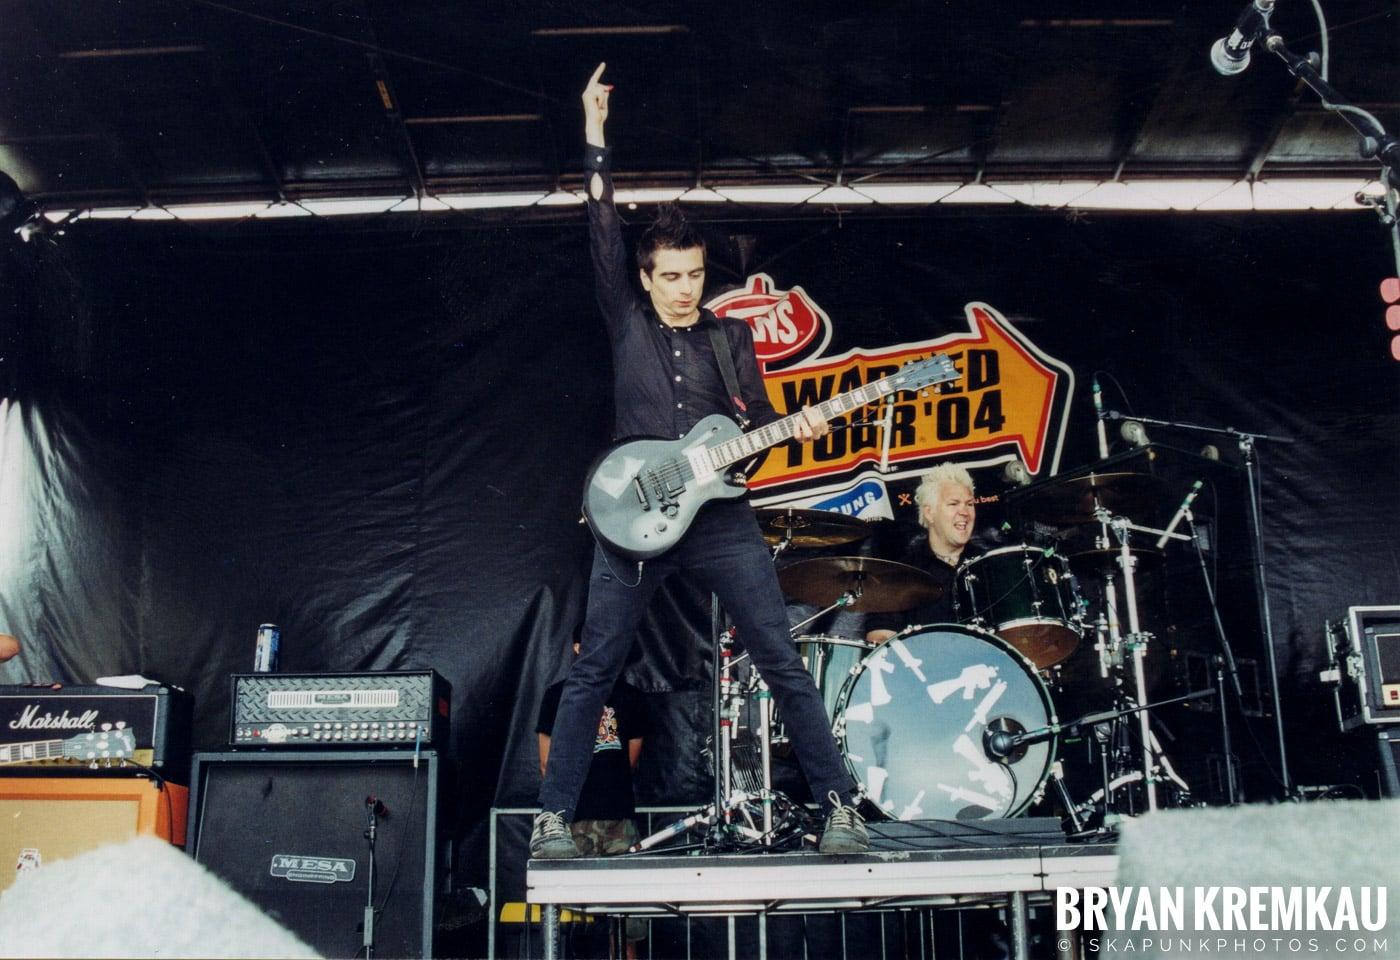 Anti-Flag @ Vans Warped Tour, Randall's Island, NYC - 8.7.04 (13)